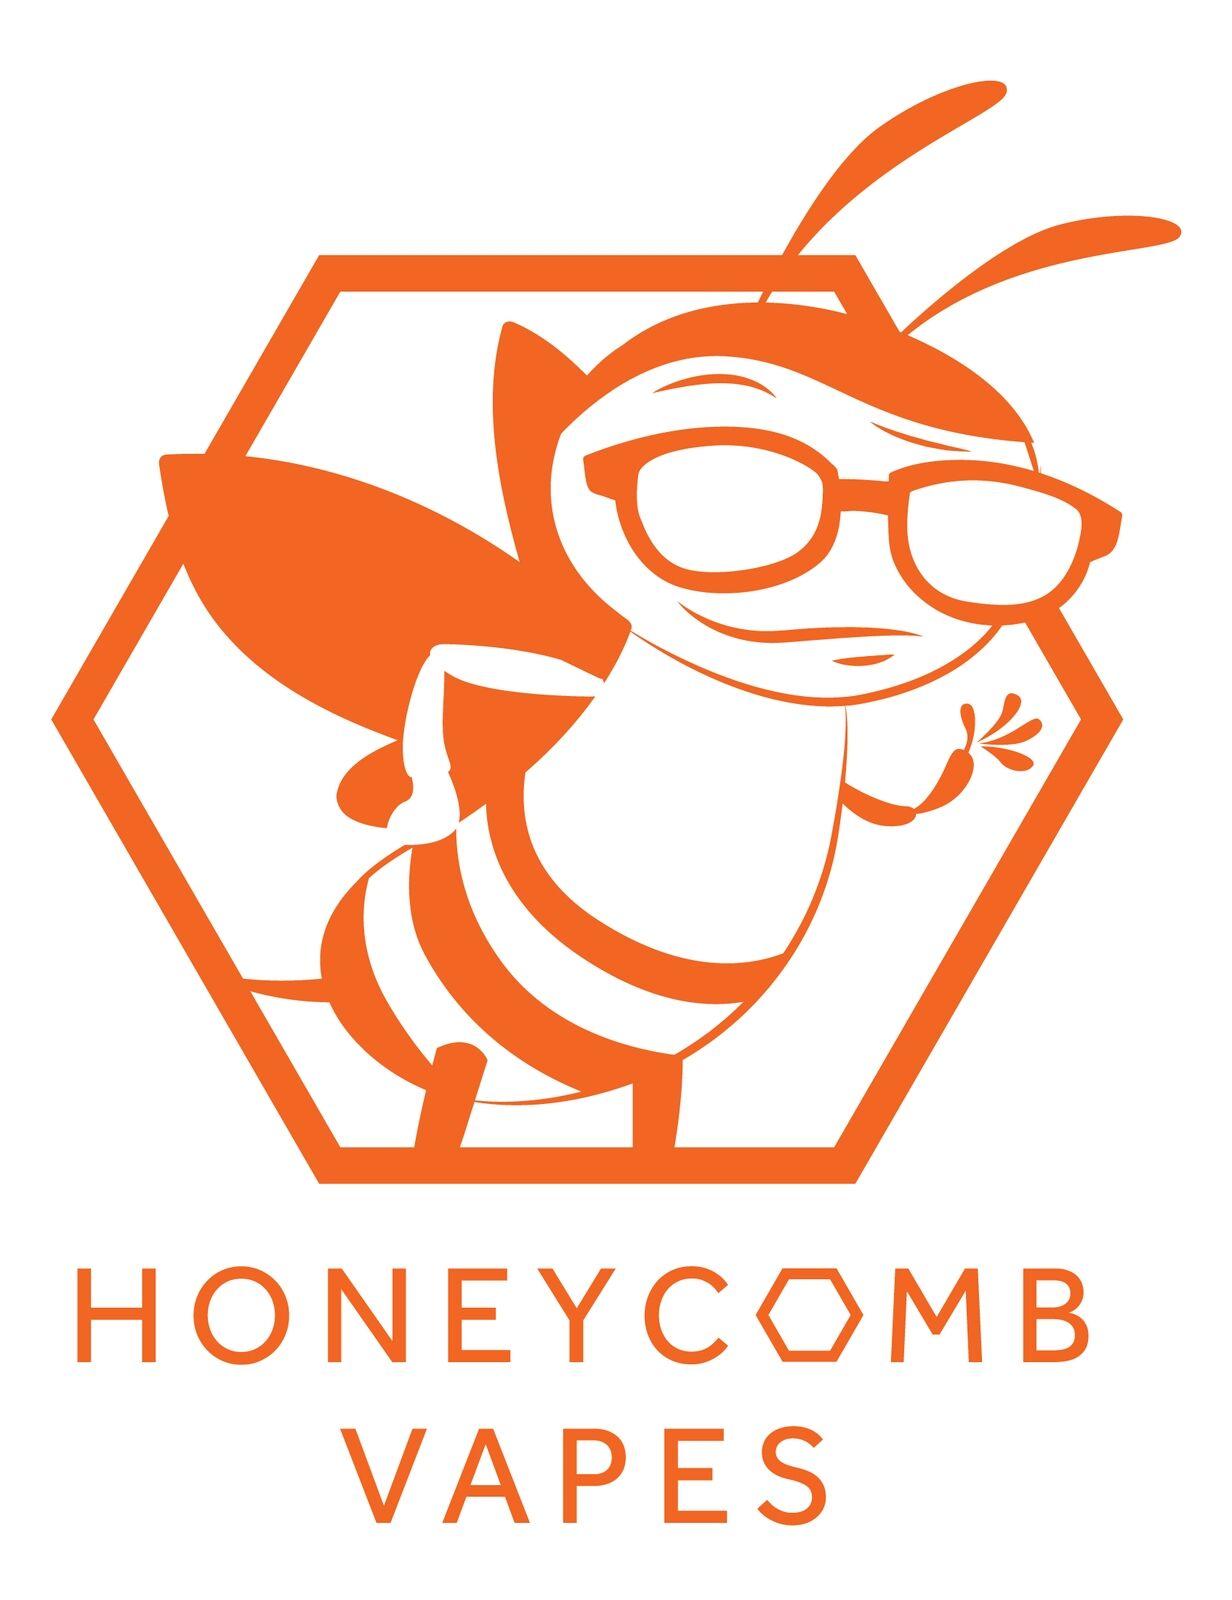 HoneyComb Vapors